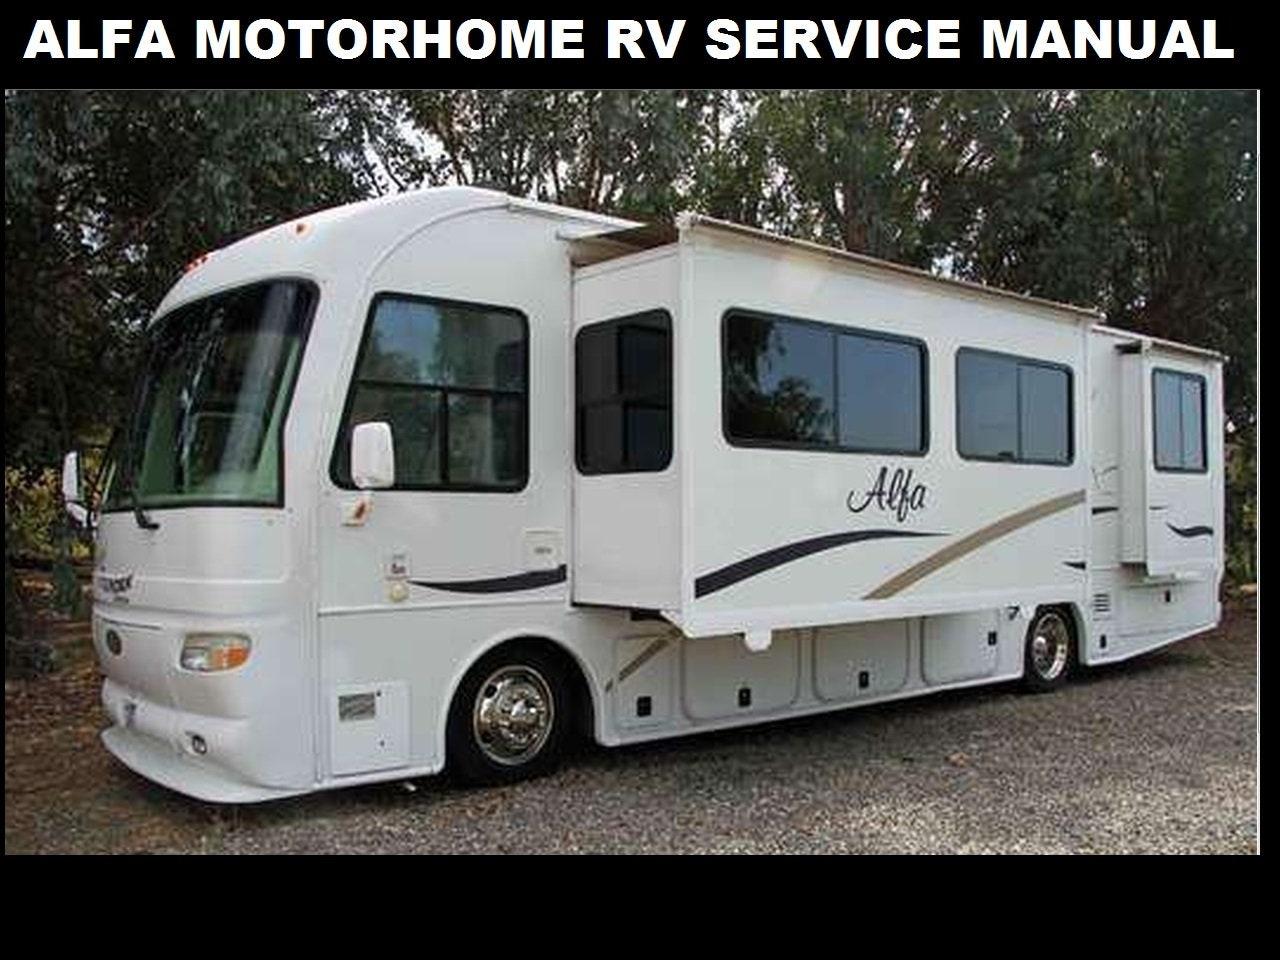 Alfa Rv Motorhome Service Manual 320pg For 2005 2006 Motorcoach Operation Maintenance Appliance Repair